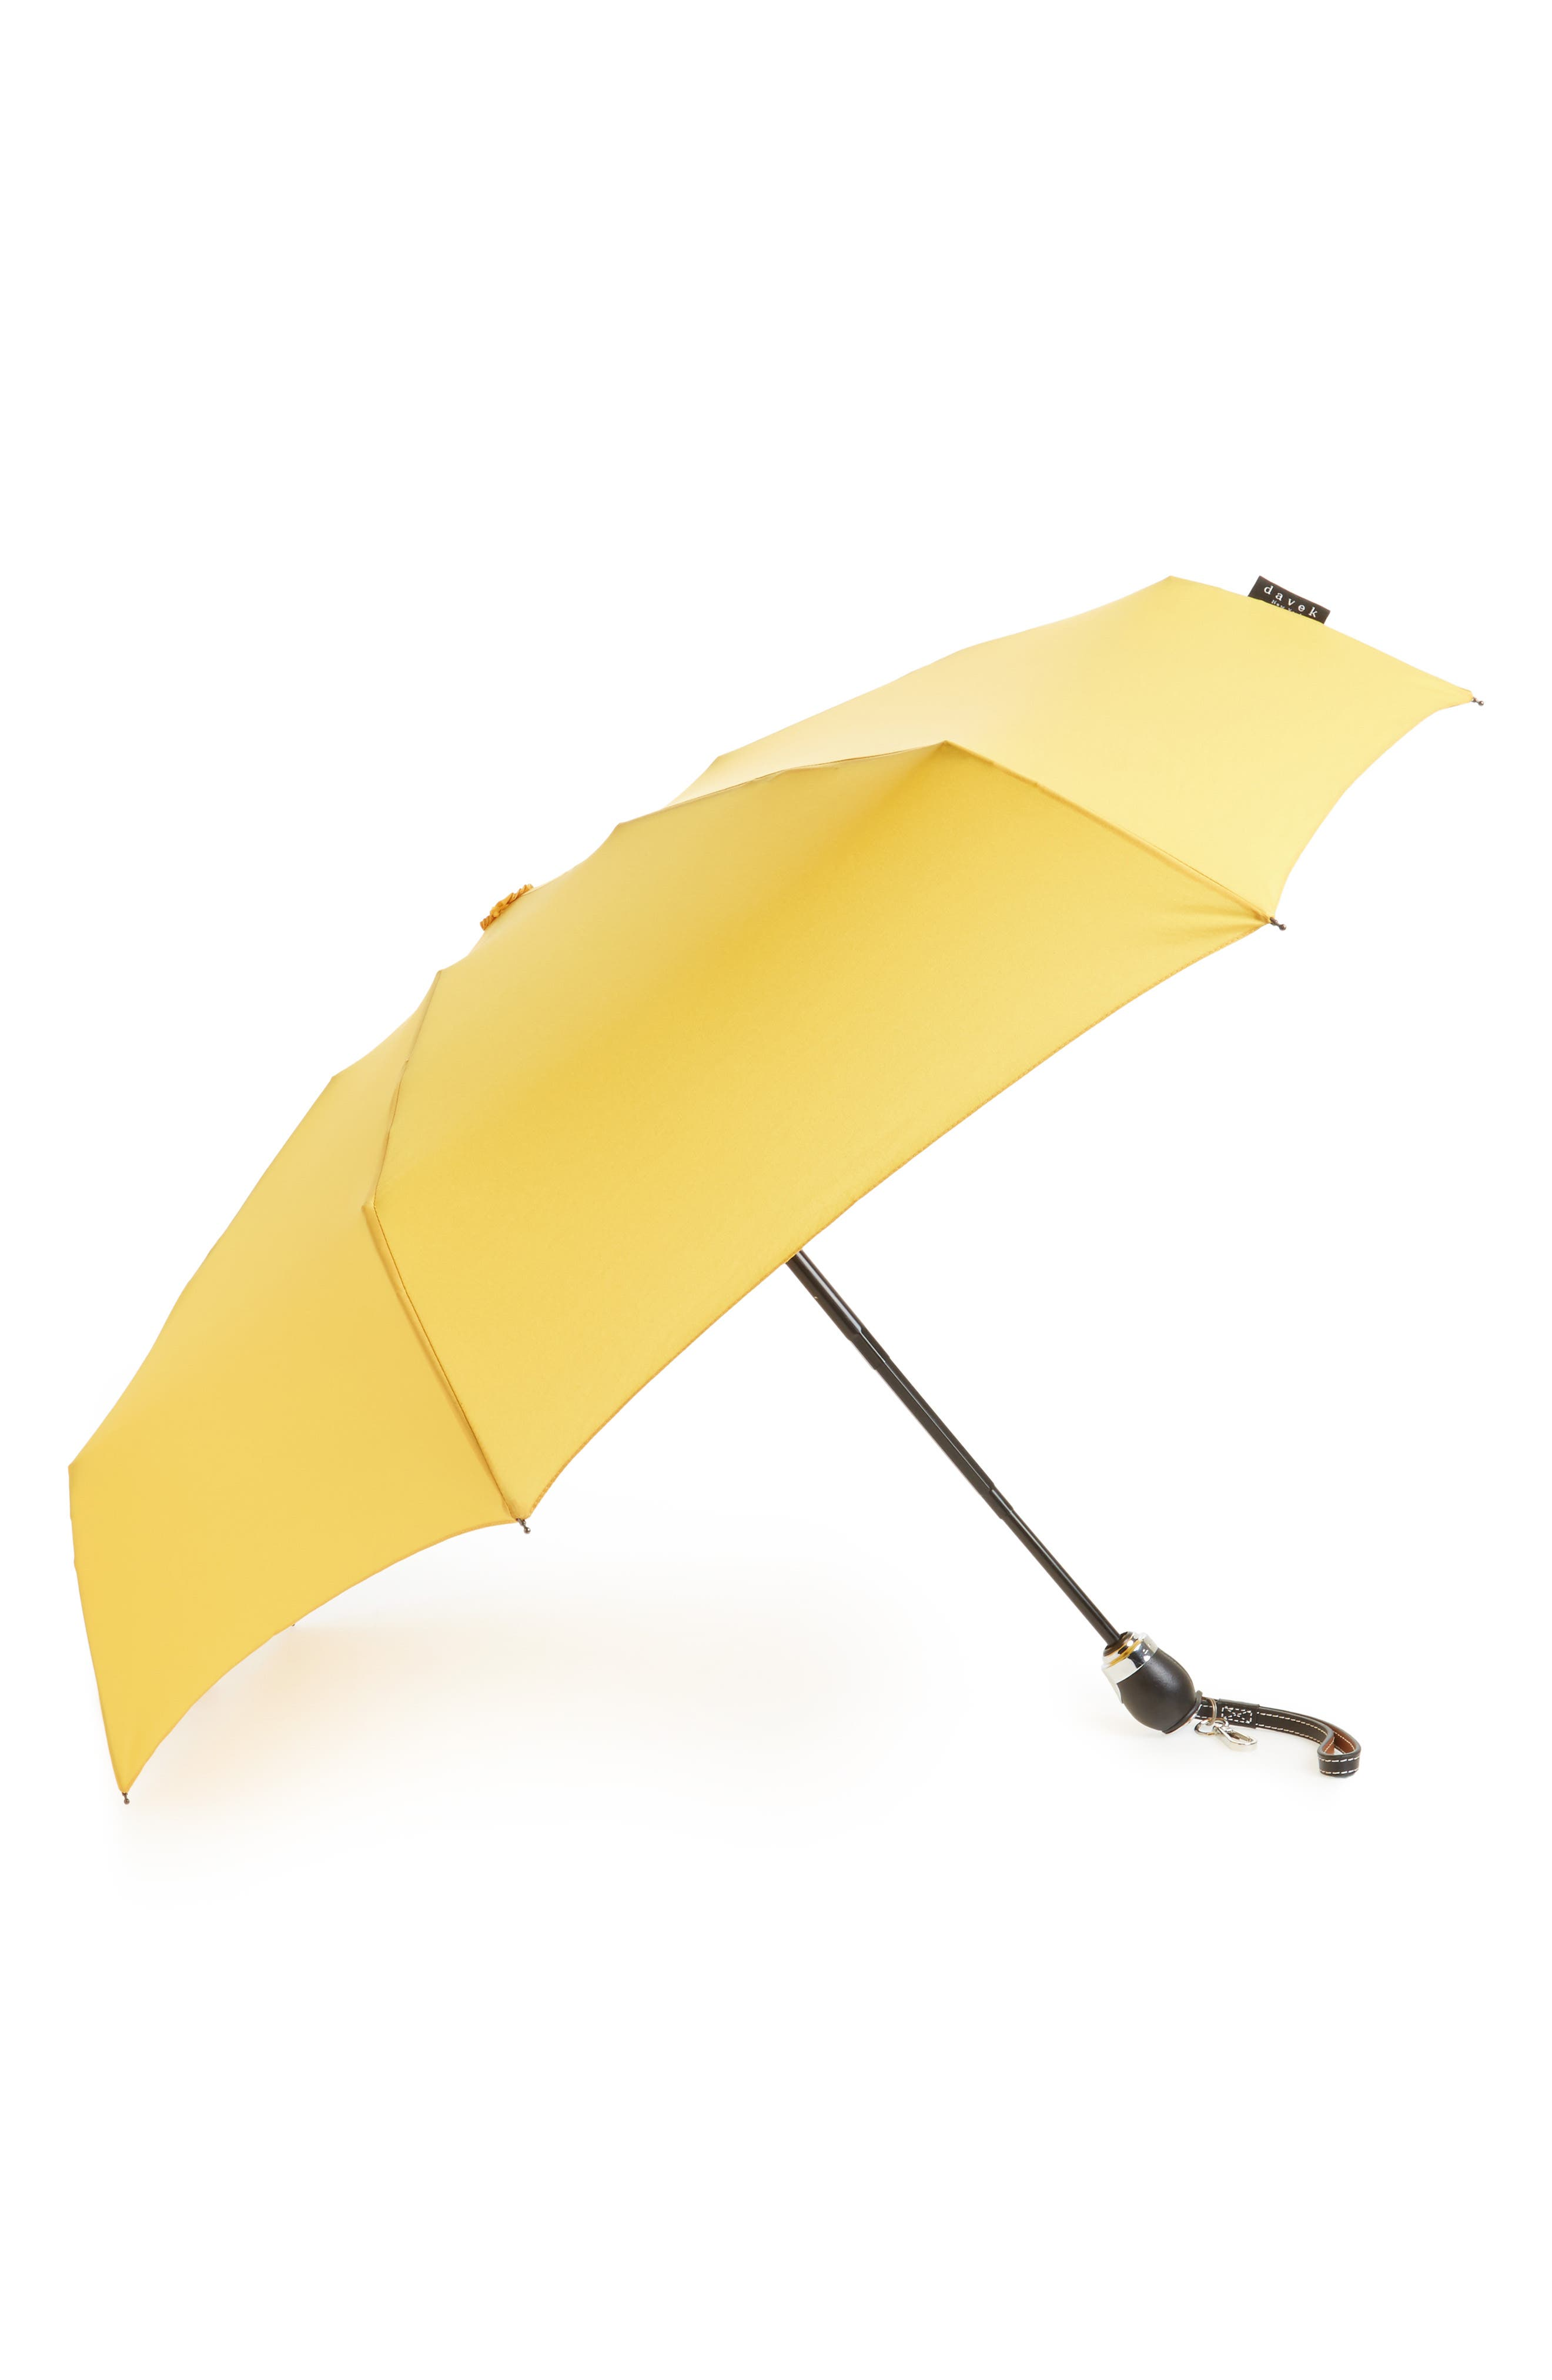 Traveler Umbrella,                             Main thumbnail 1, color,                             Sunflower Yellow